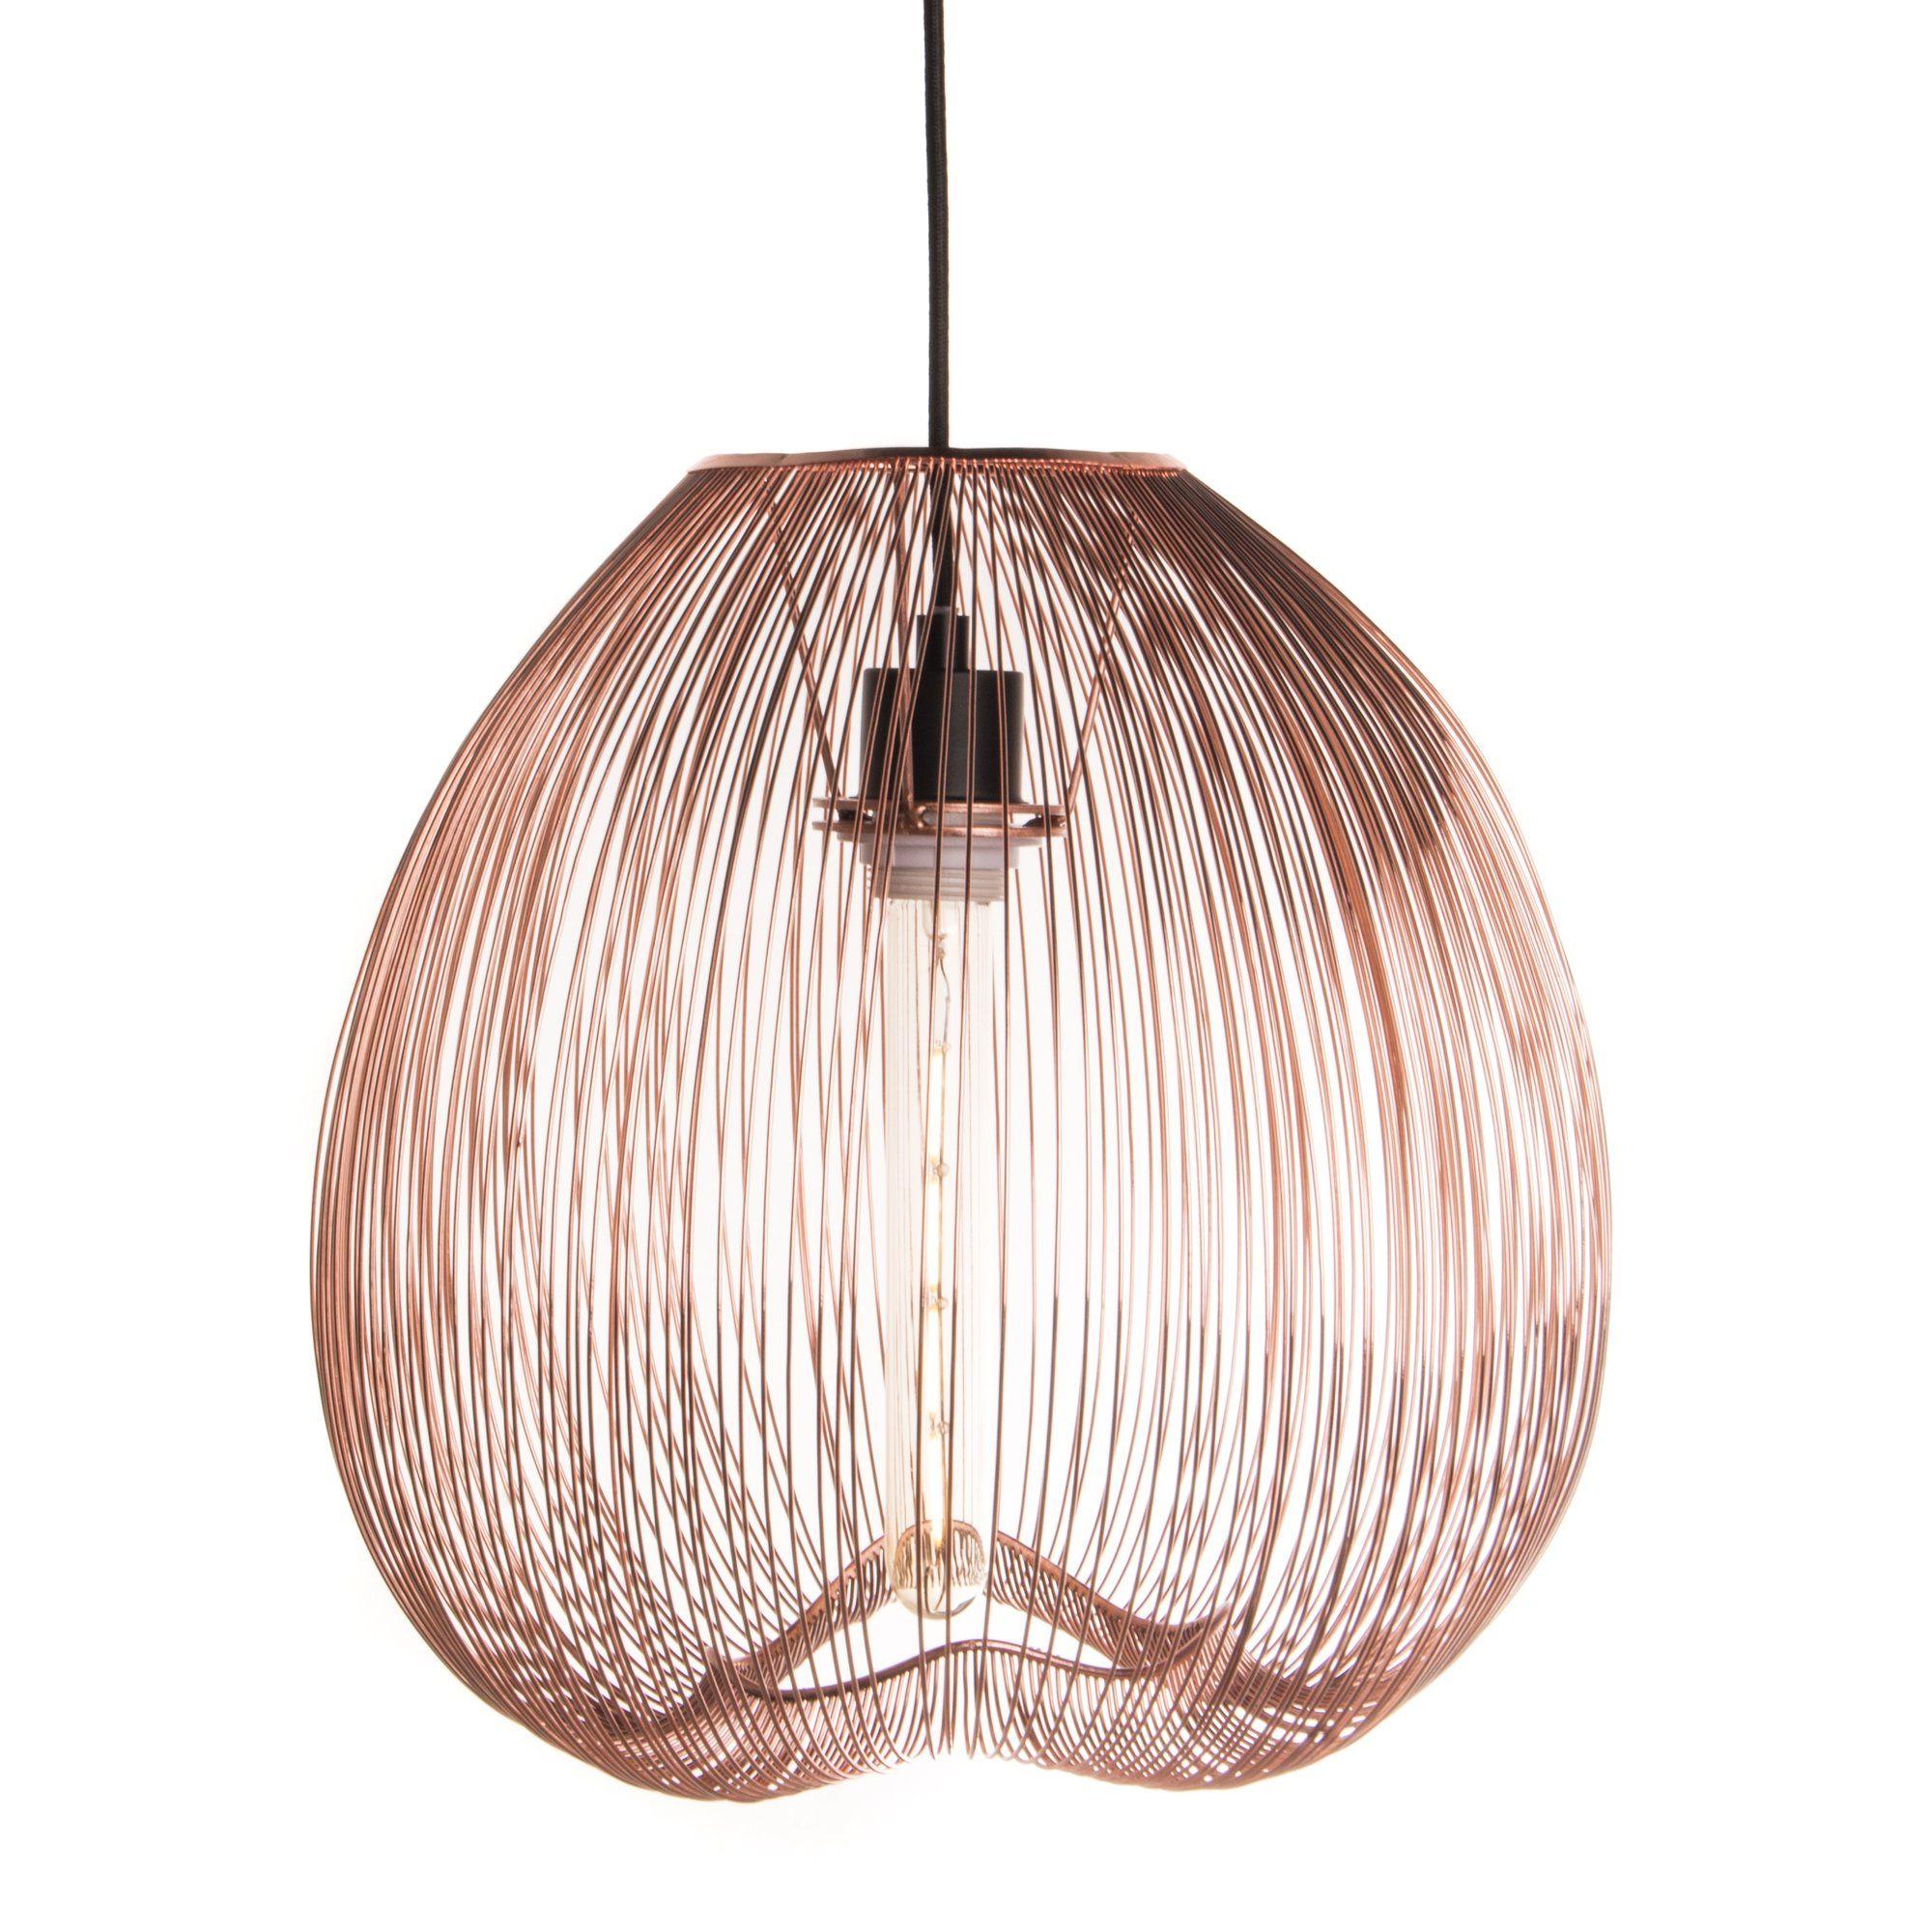 1 Light Geometric Globe Pendants For Well Liked Pennell 1 Light Geometric Pendant Lamp (View 2 of 20)